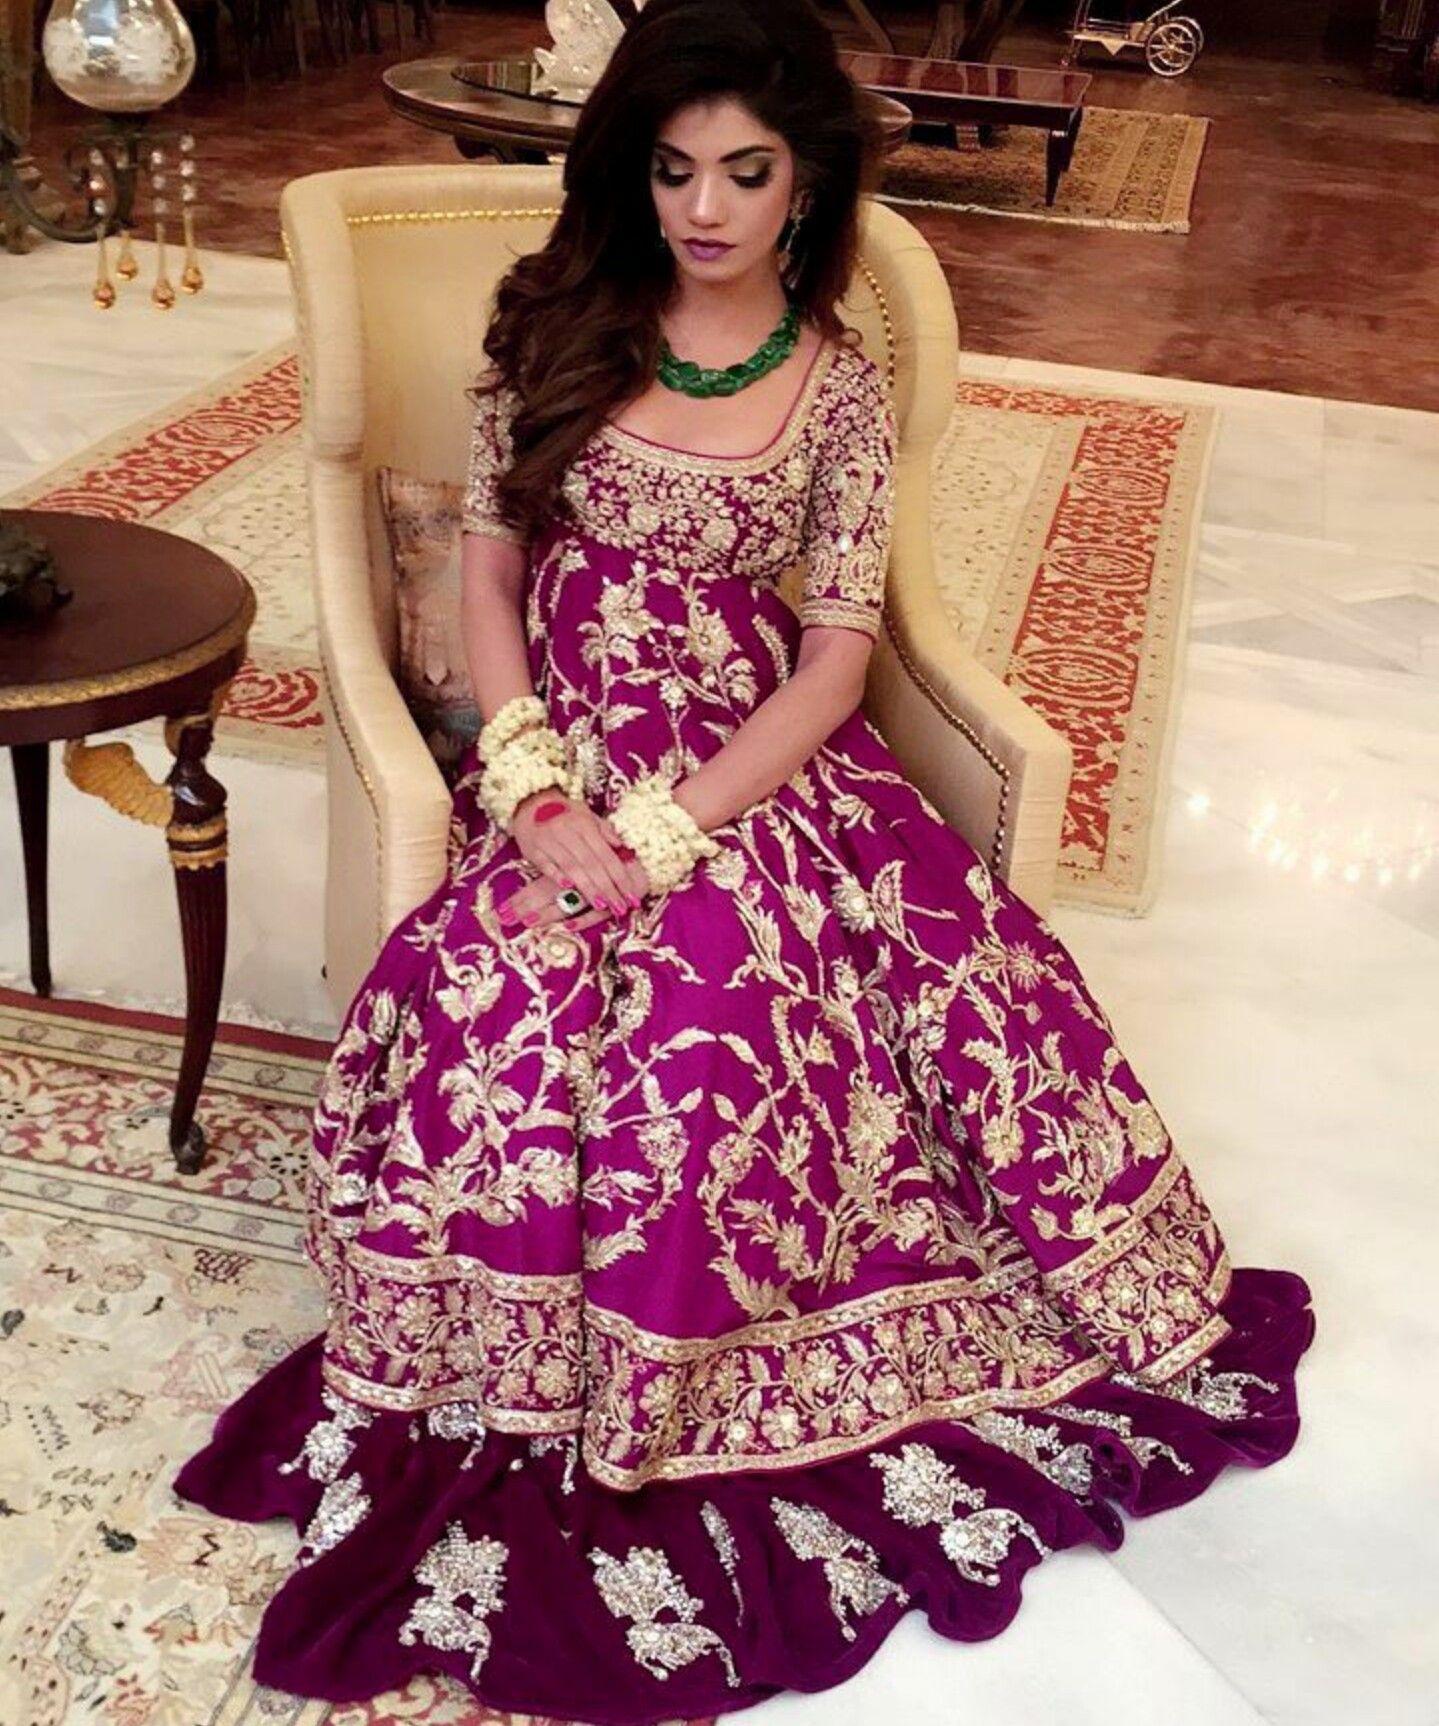 Pin de Nabila Anwar en bridal Inspo | Pinterest